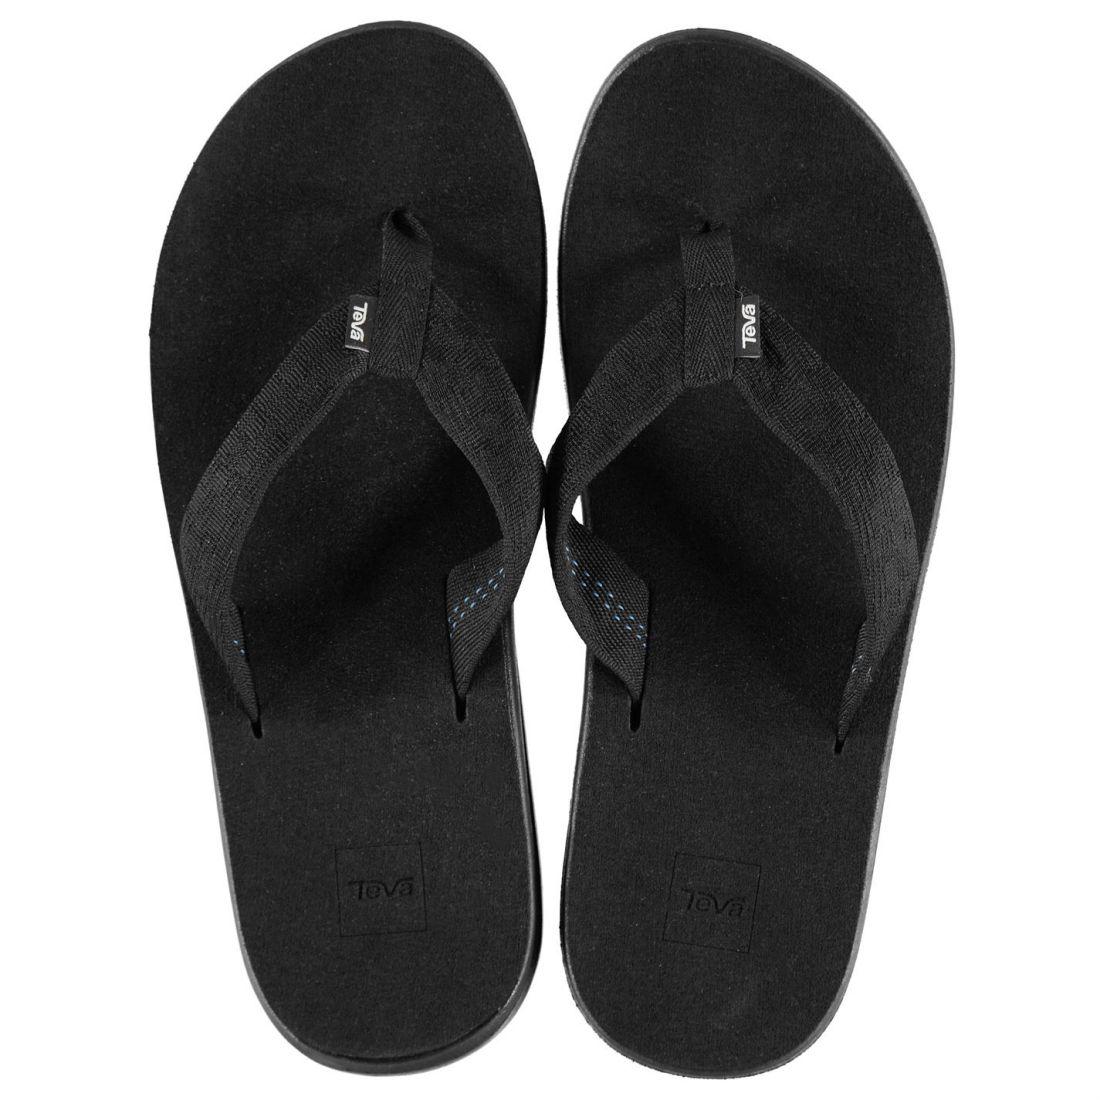 Teva Voya Flip Flops Mens Gents Sandals Lightweight Strap Toe Post Summer